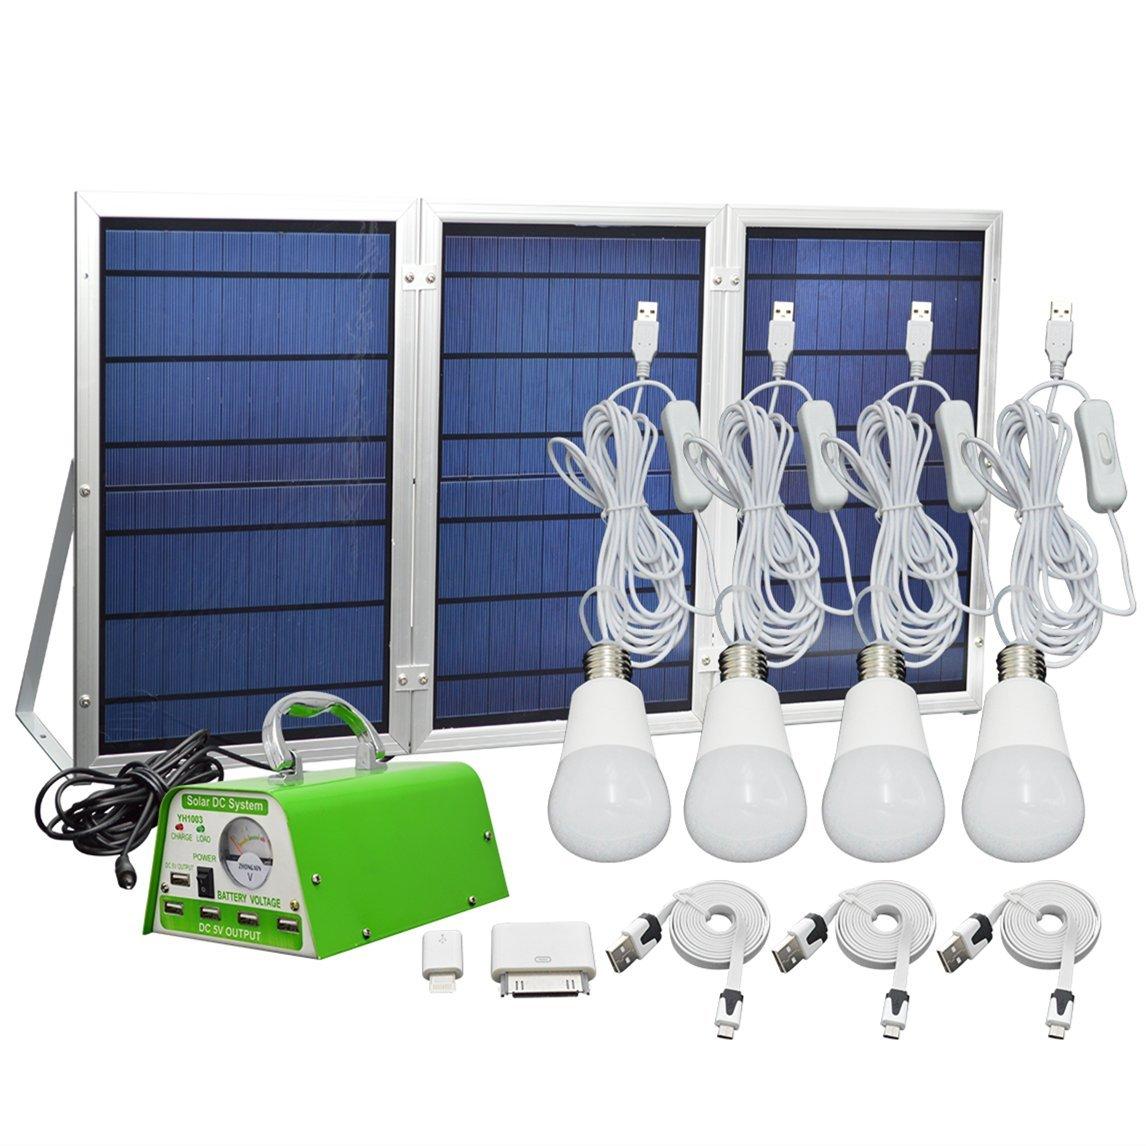 Best Solar Panel Kits HKYH 30W